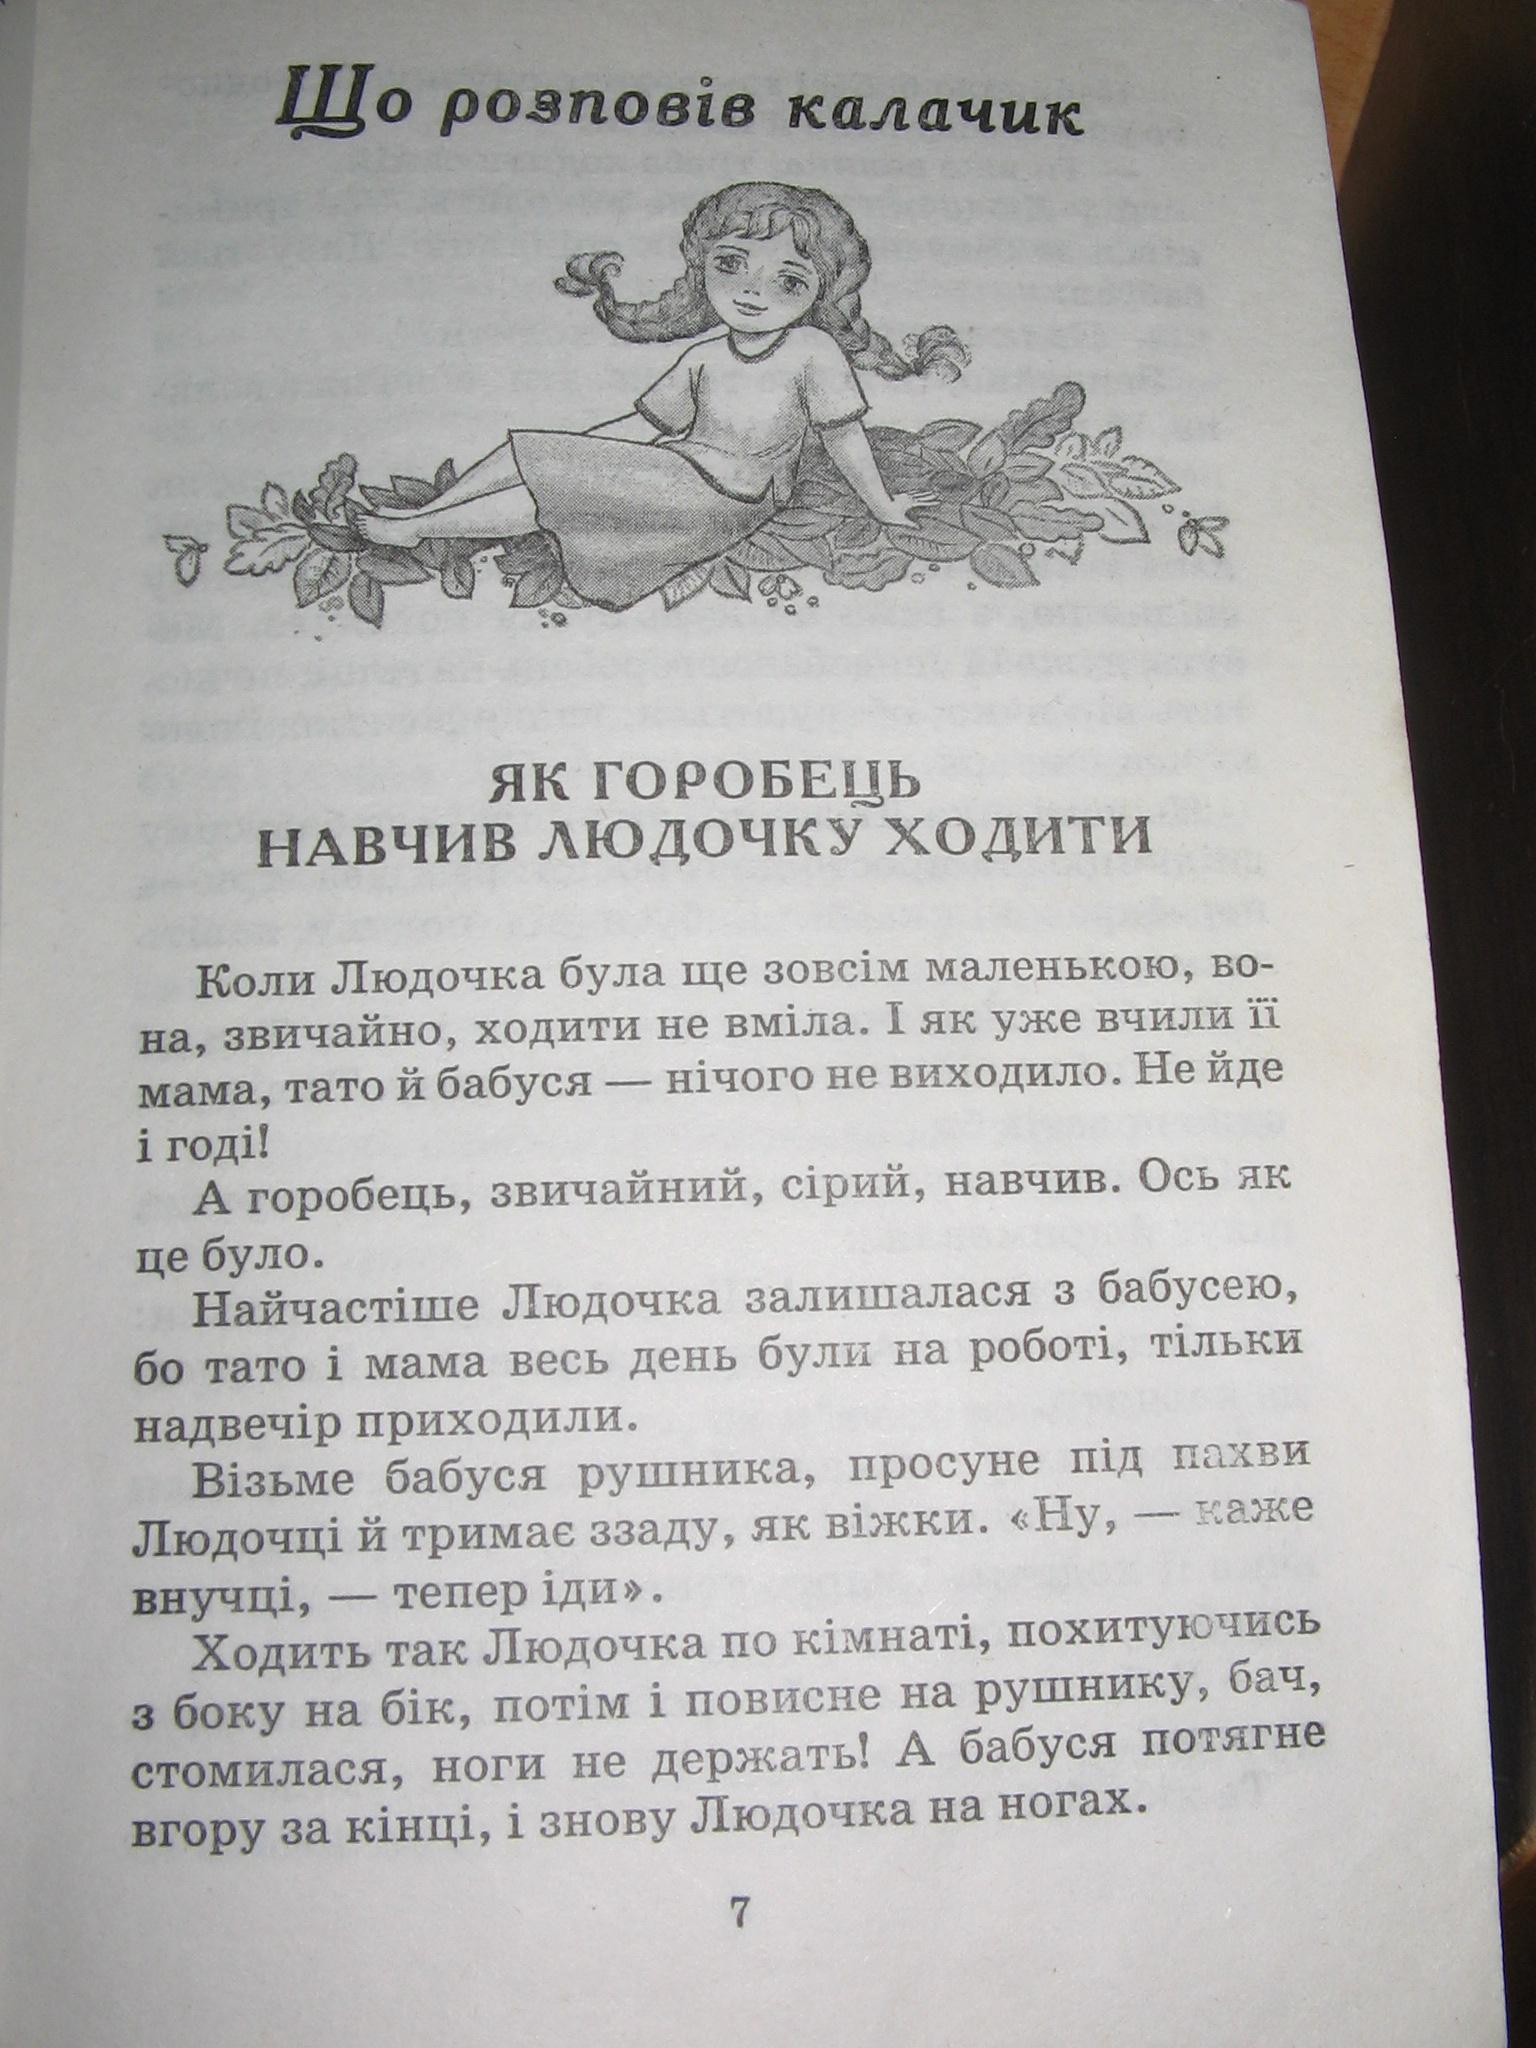 http://s6.uploads.ru/Bh1sp.jpg